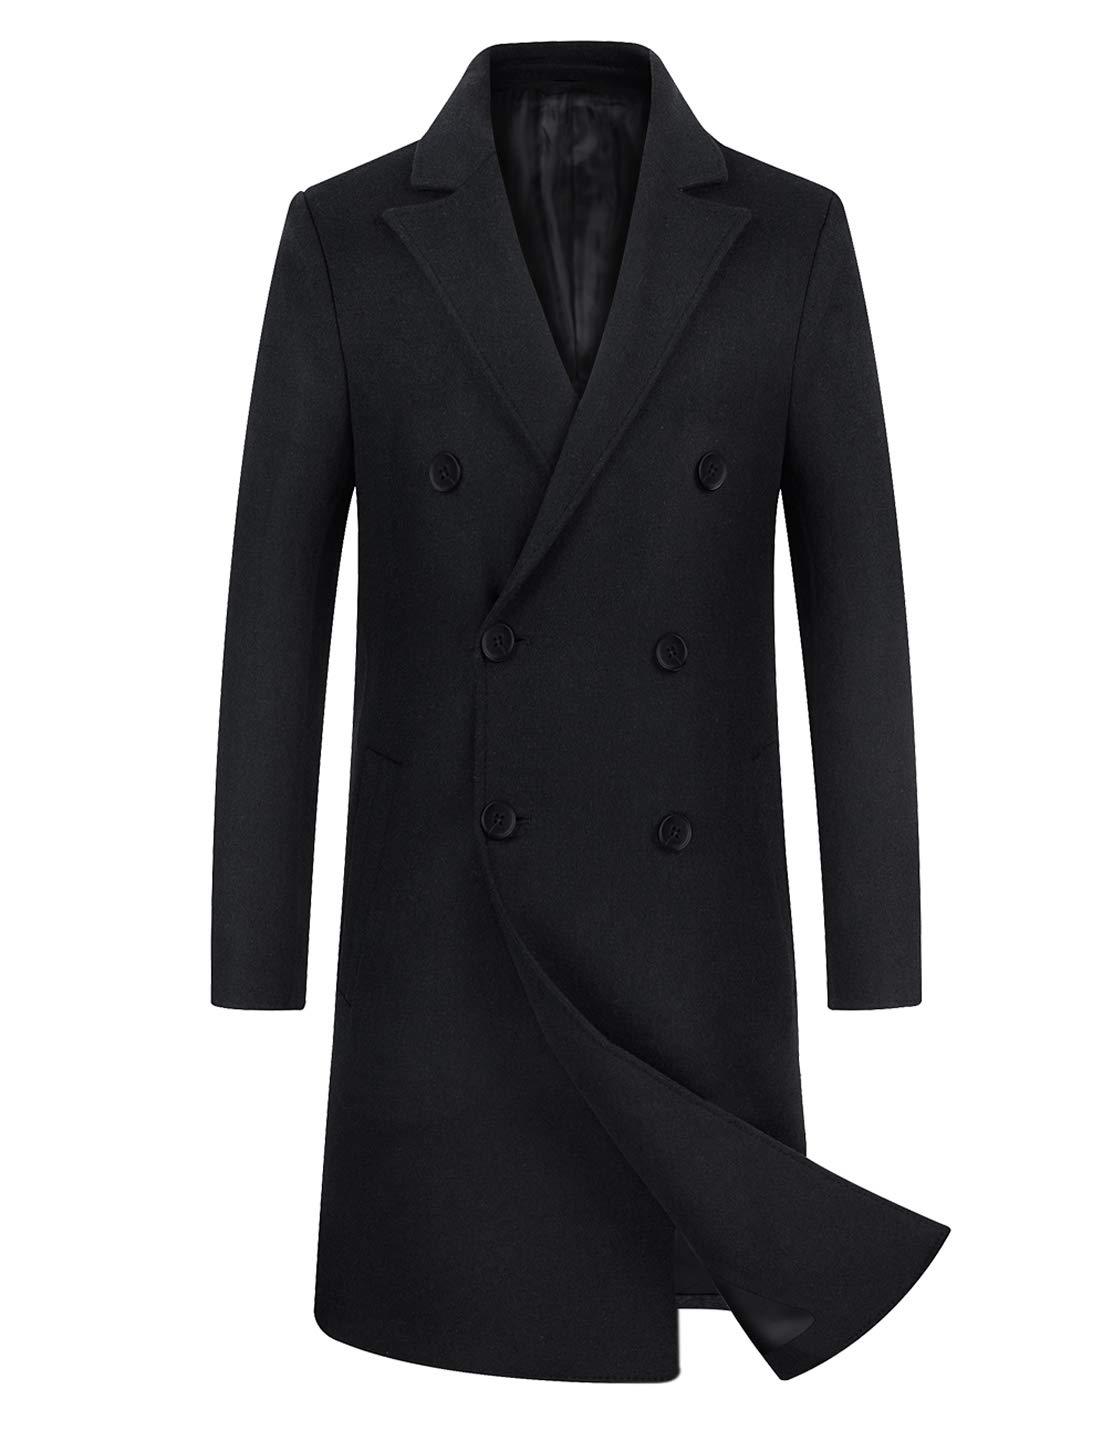 zeetoo Men's Wool Trench Coat Winter Slim Fit Wool Jacket Long Peacoat Overcoat Black Double-Breasted XX-Large by zeetoo